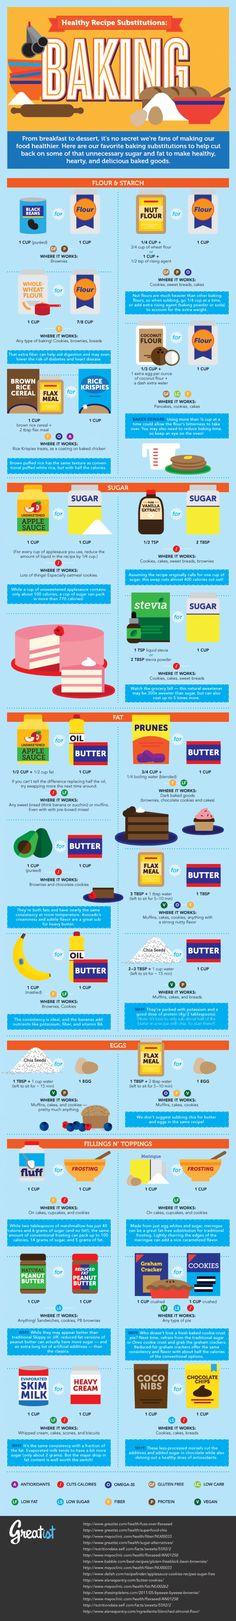 Healthy baking ingredient subs